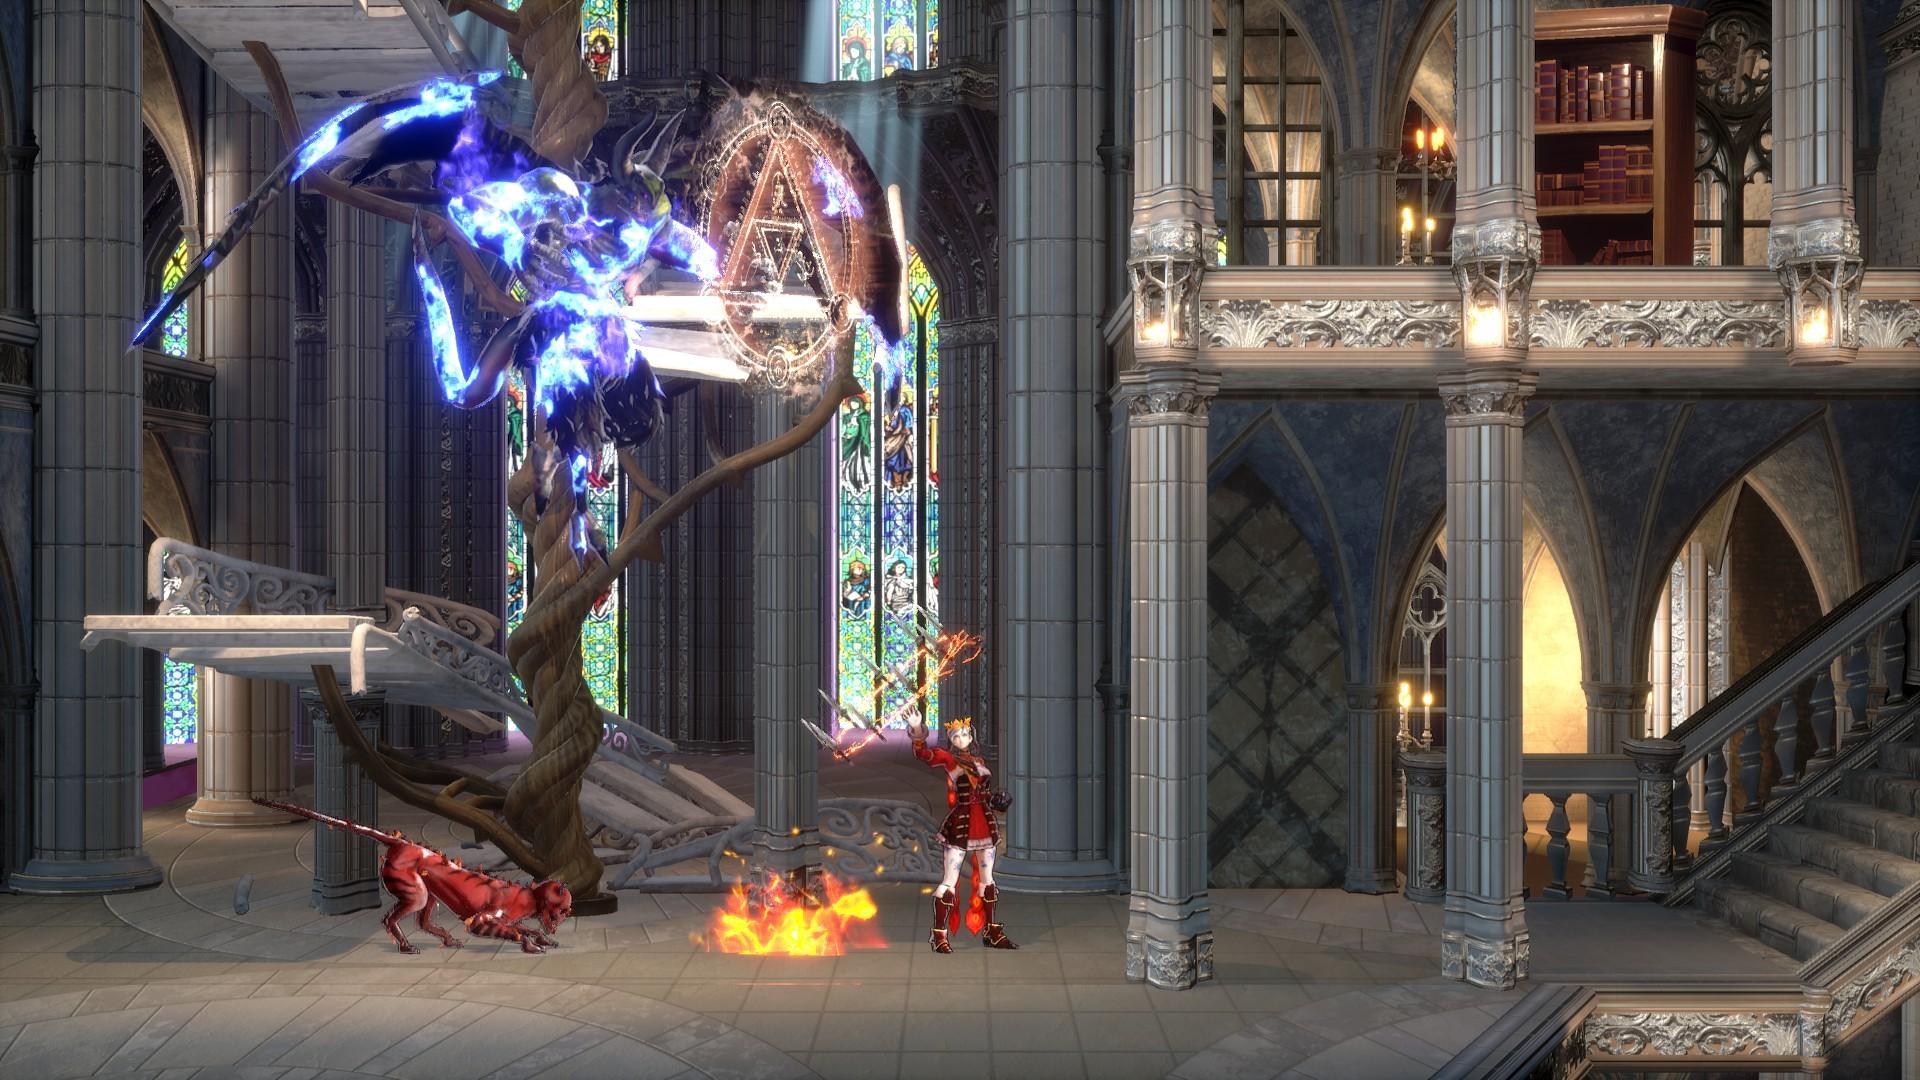 505Games宣布将在6月18日发售 《血污:夜之仪式》 ,面向全平台